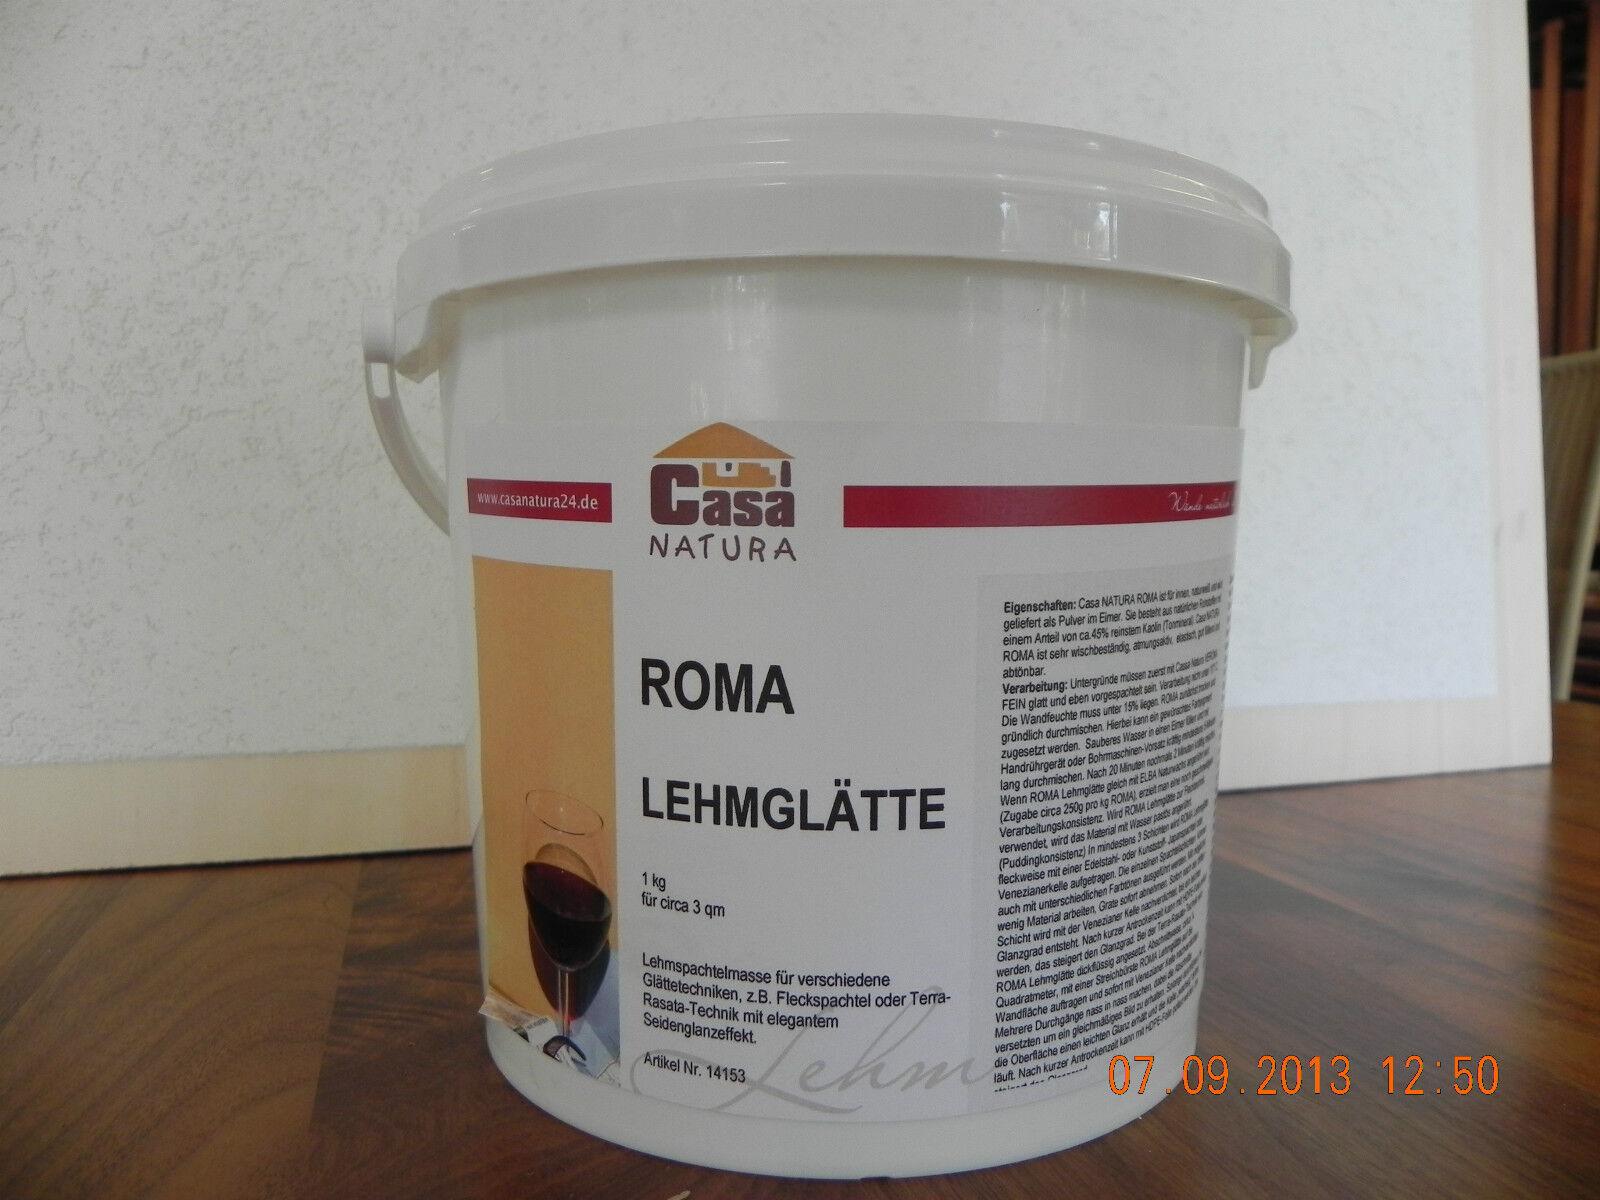 CasaNatura Lehmglätte Glanzspachtel Roma  3Kg für ca. 9m² naturweiss abtönbar